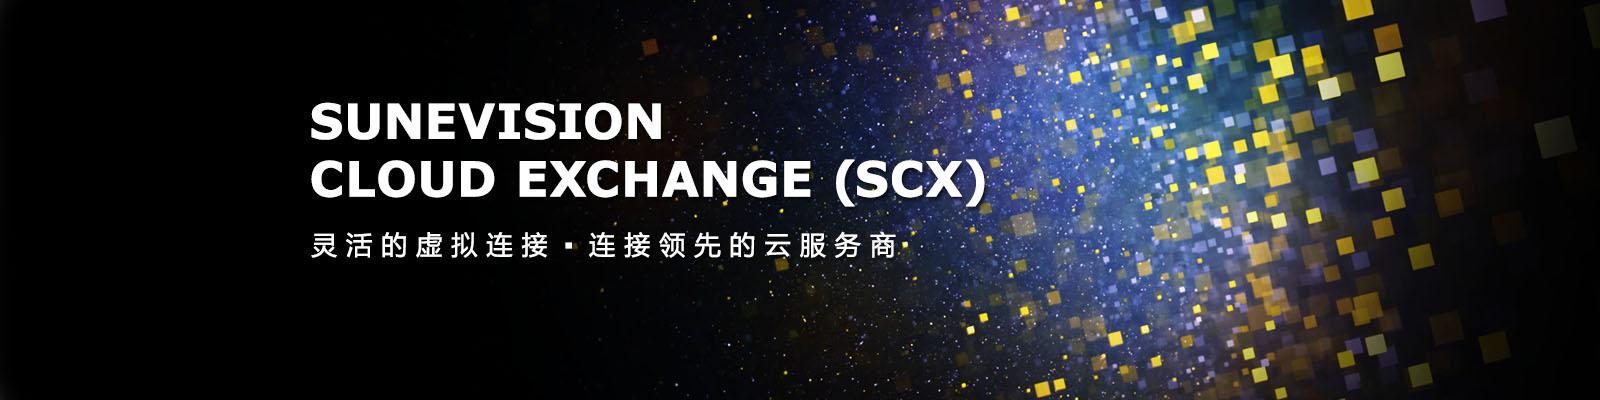 home-banner-2021-scx-sc-1